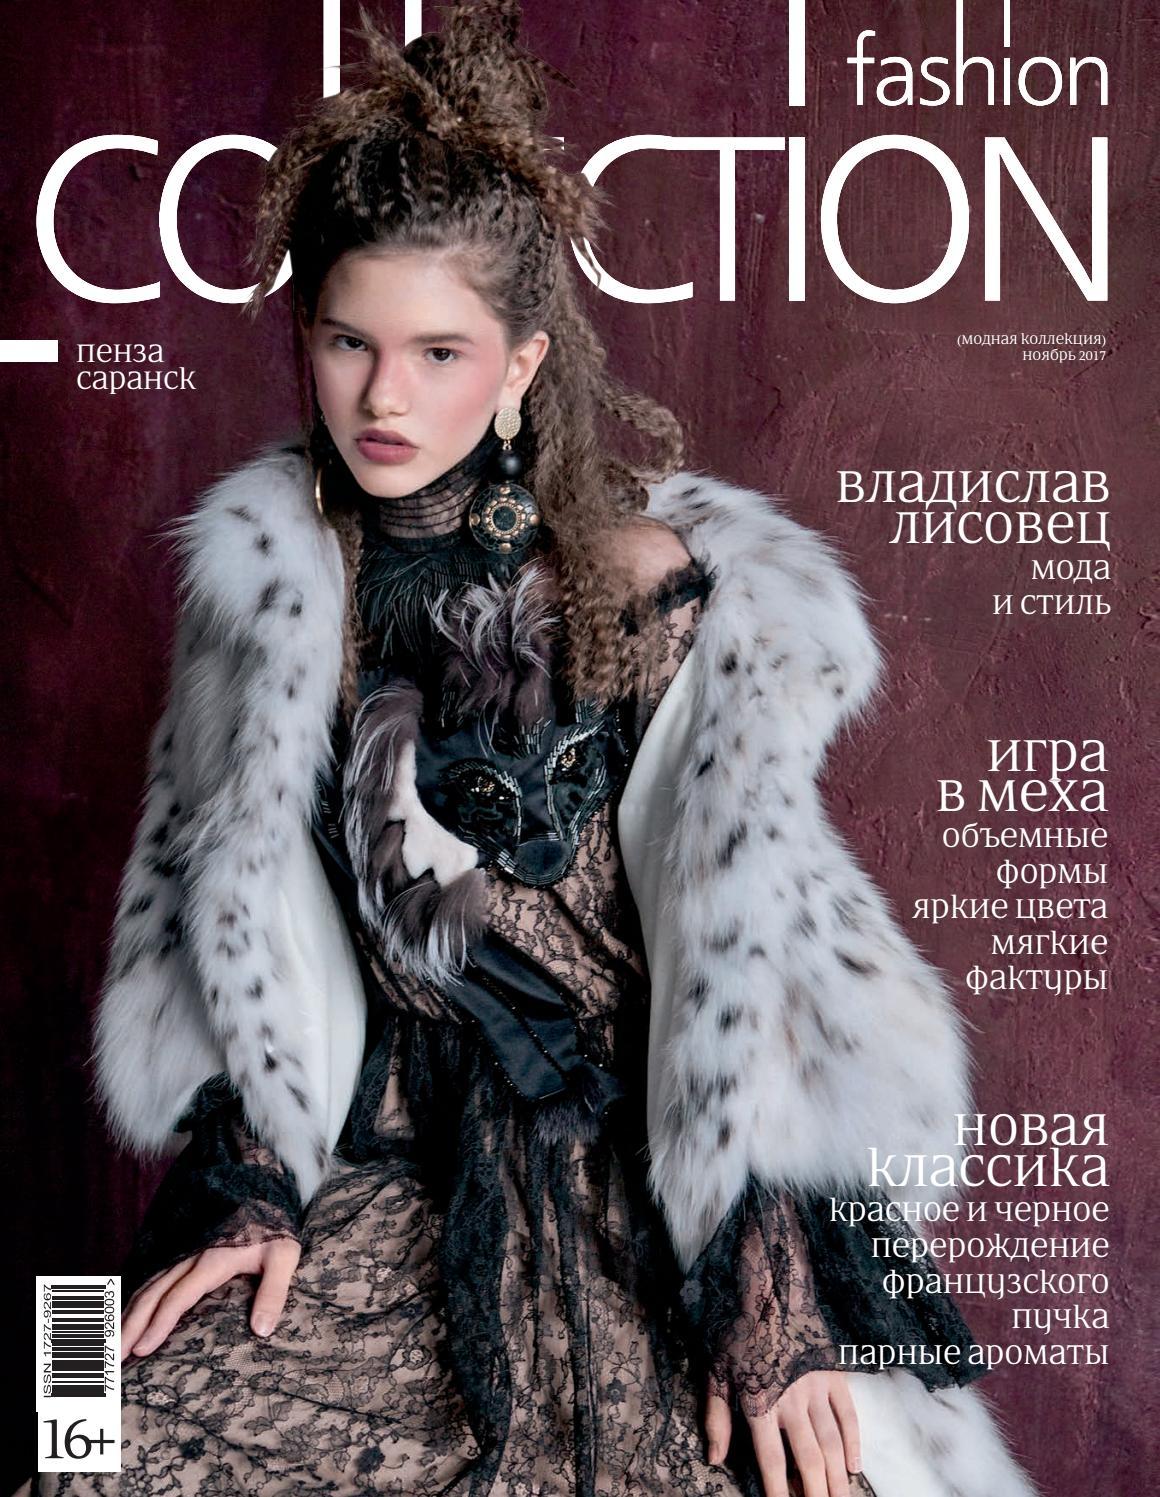 fae11fa0488 Fashion Сollection Penza November 2017 by Fashion Collection Пенза - issuu